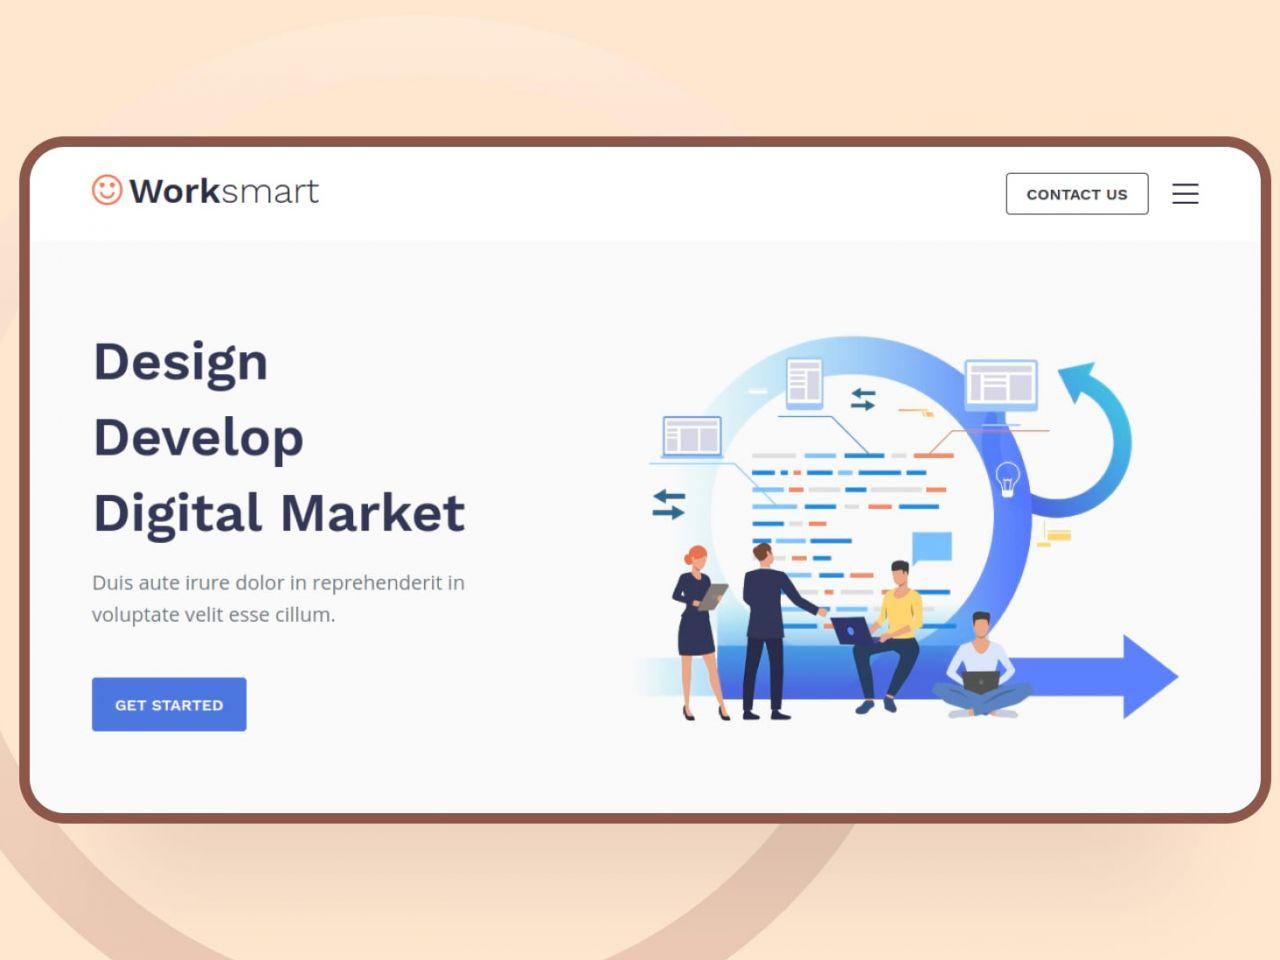 Worksmart-网站模板